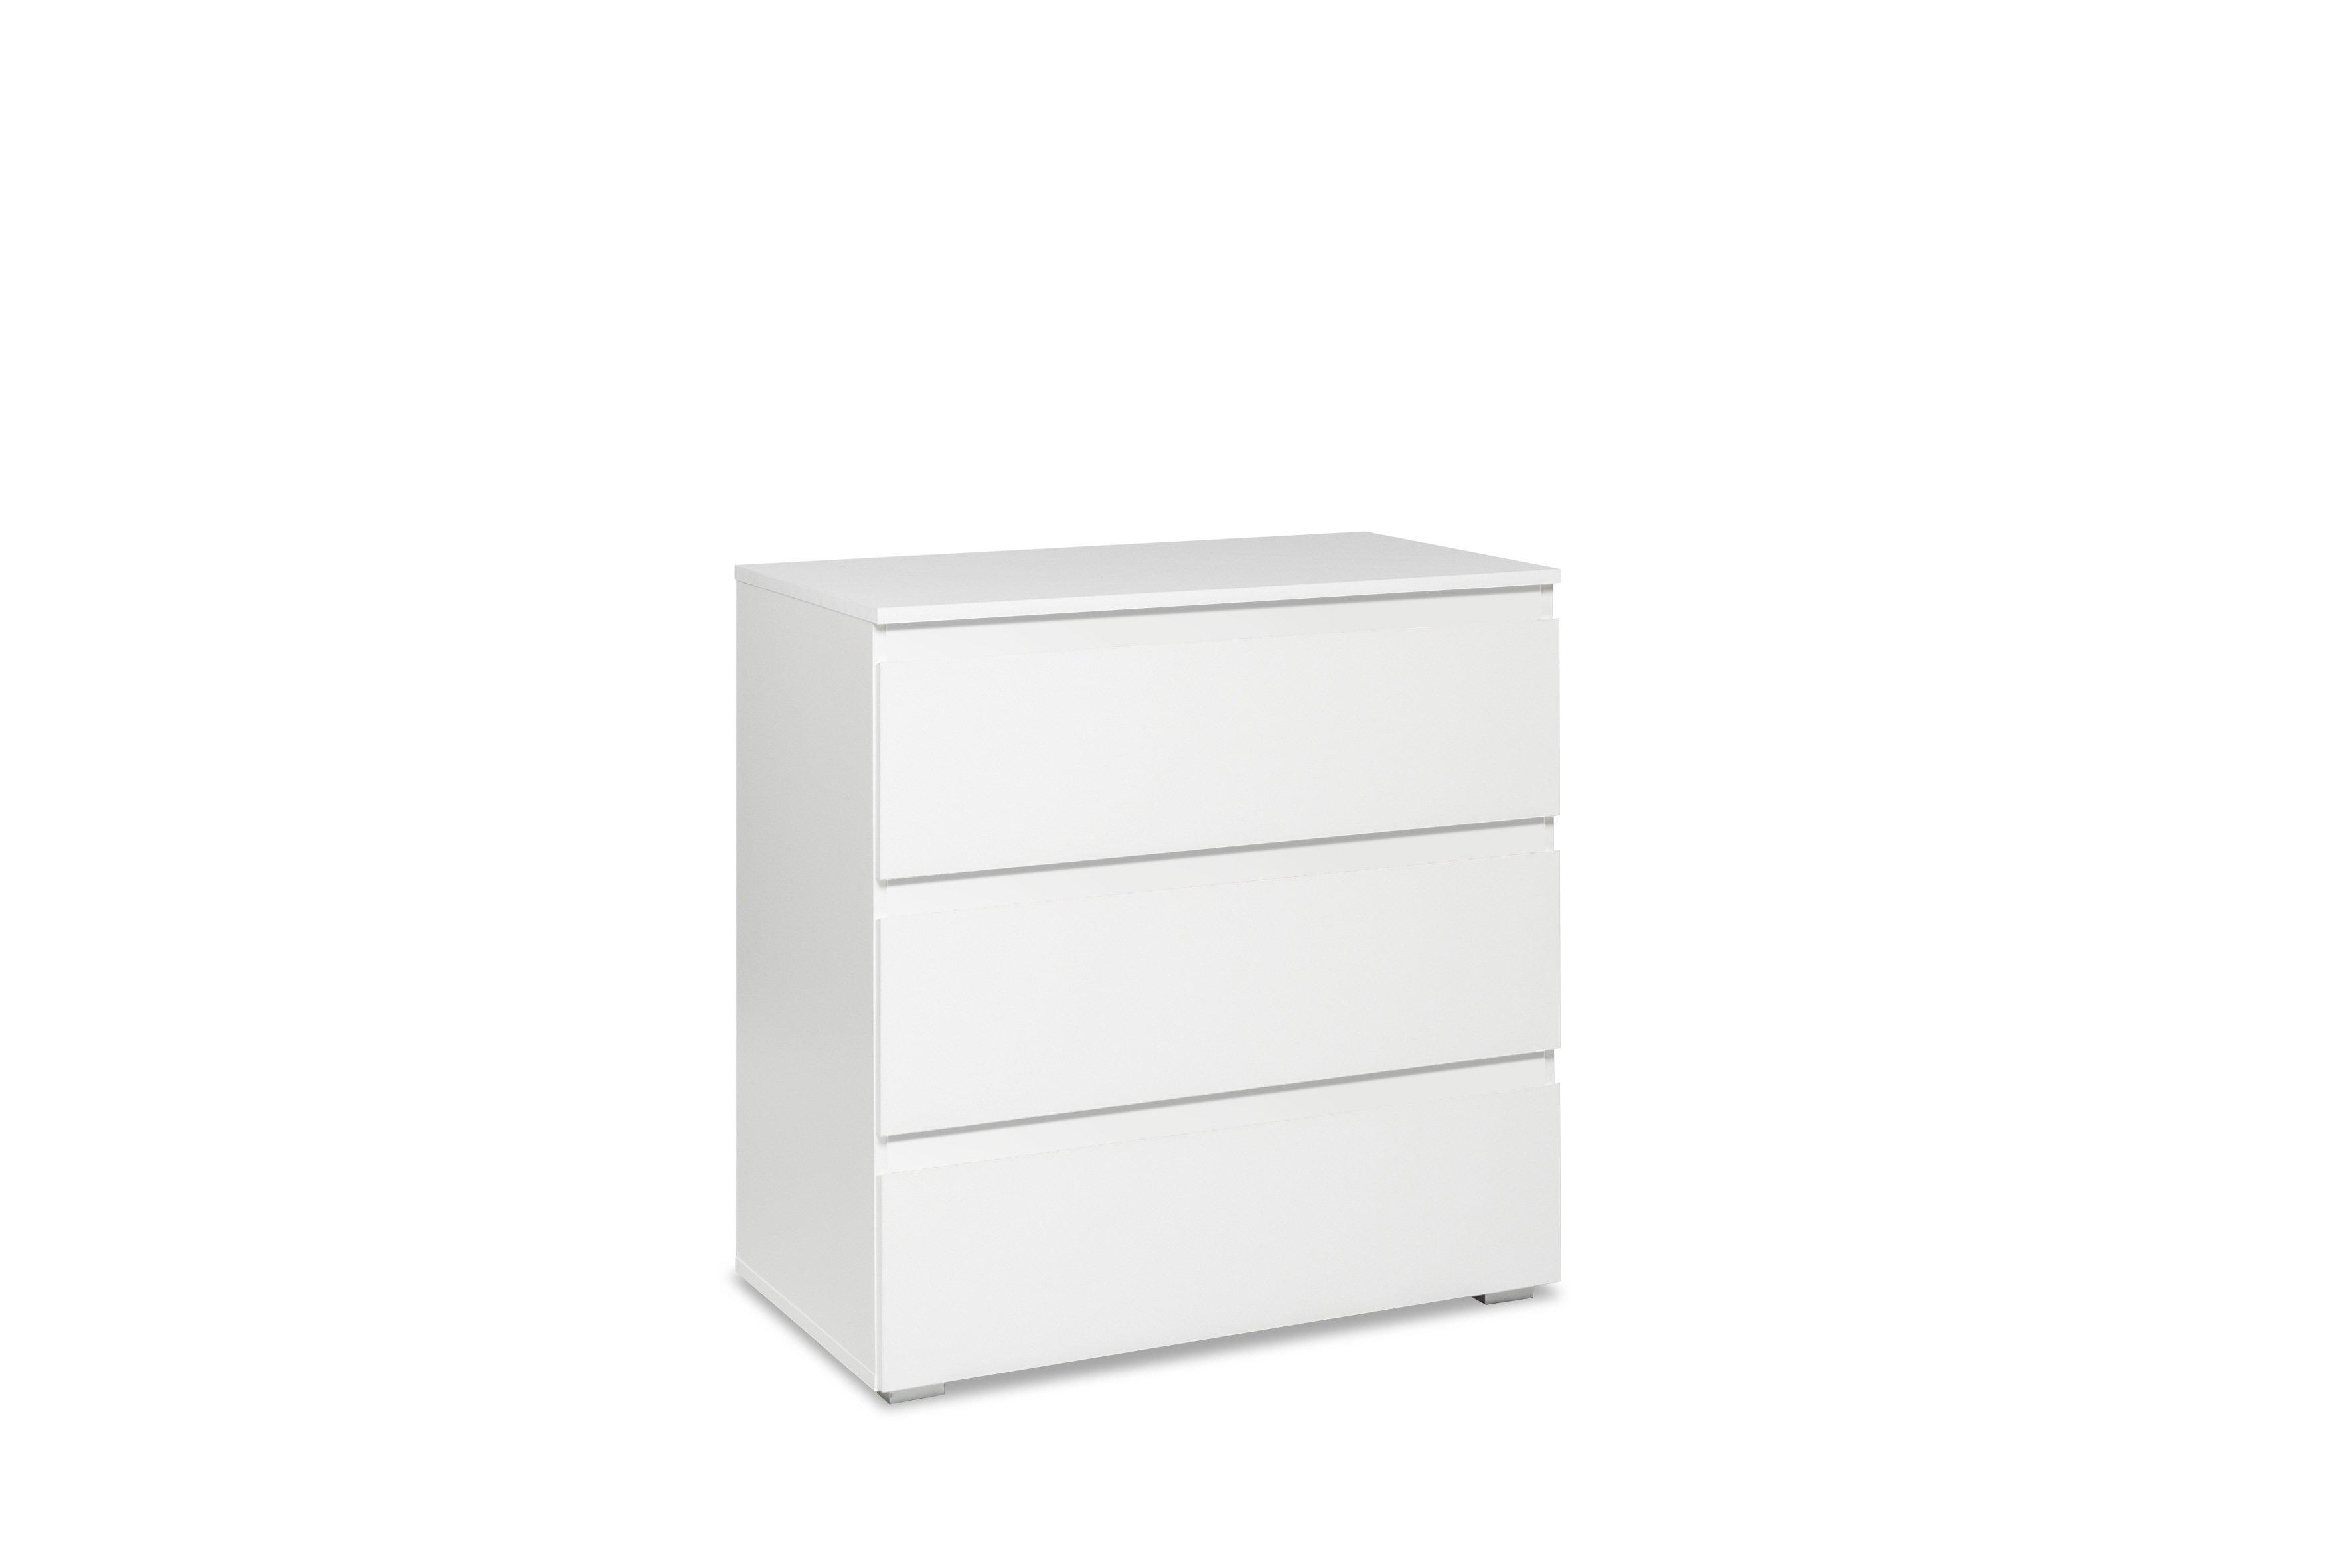 Commode contemporaine 3 tiroirs blanc mat Sophiane